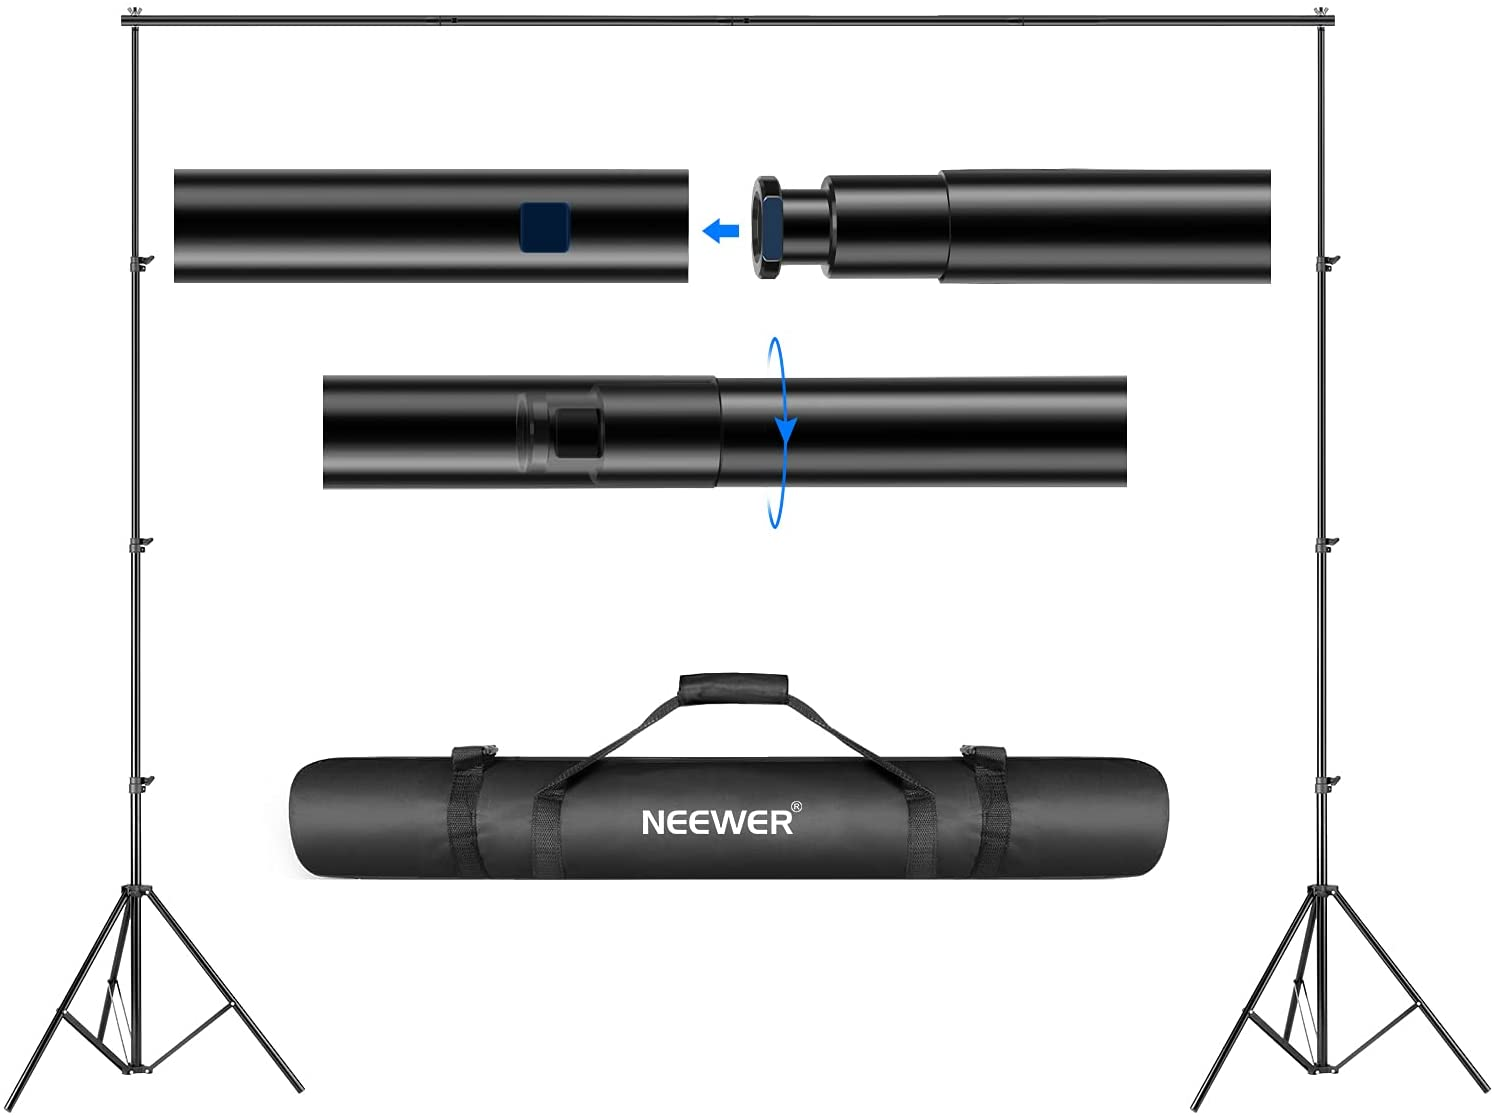 NEEWER_2.3x3m